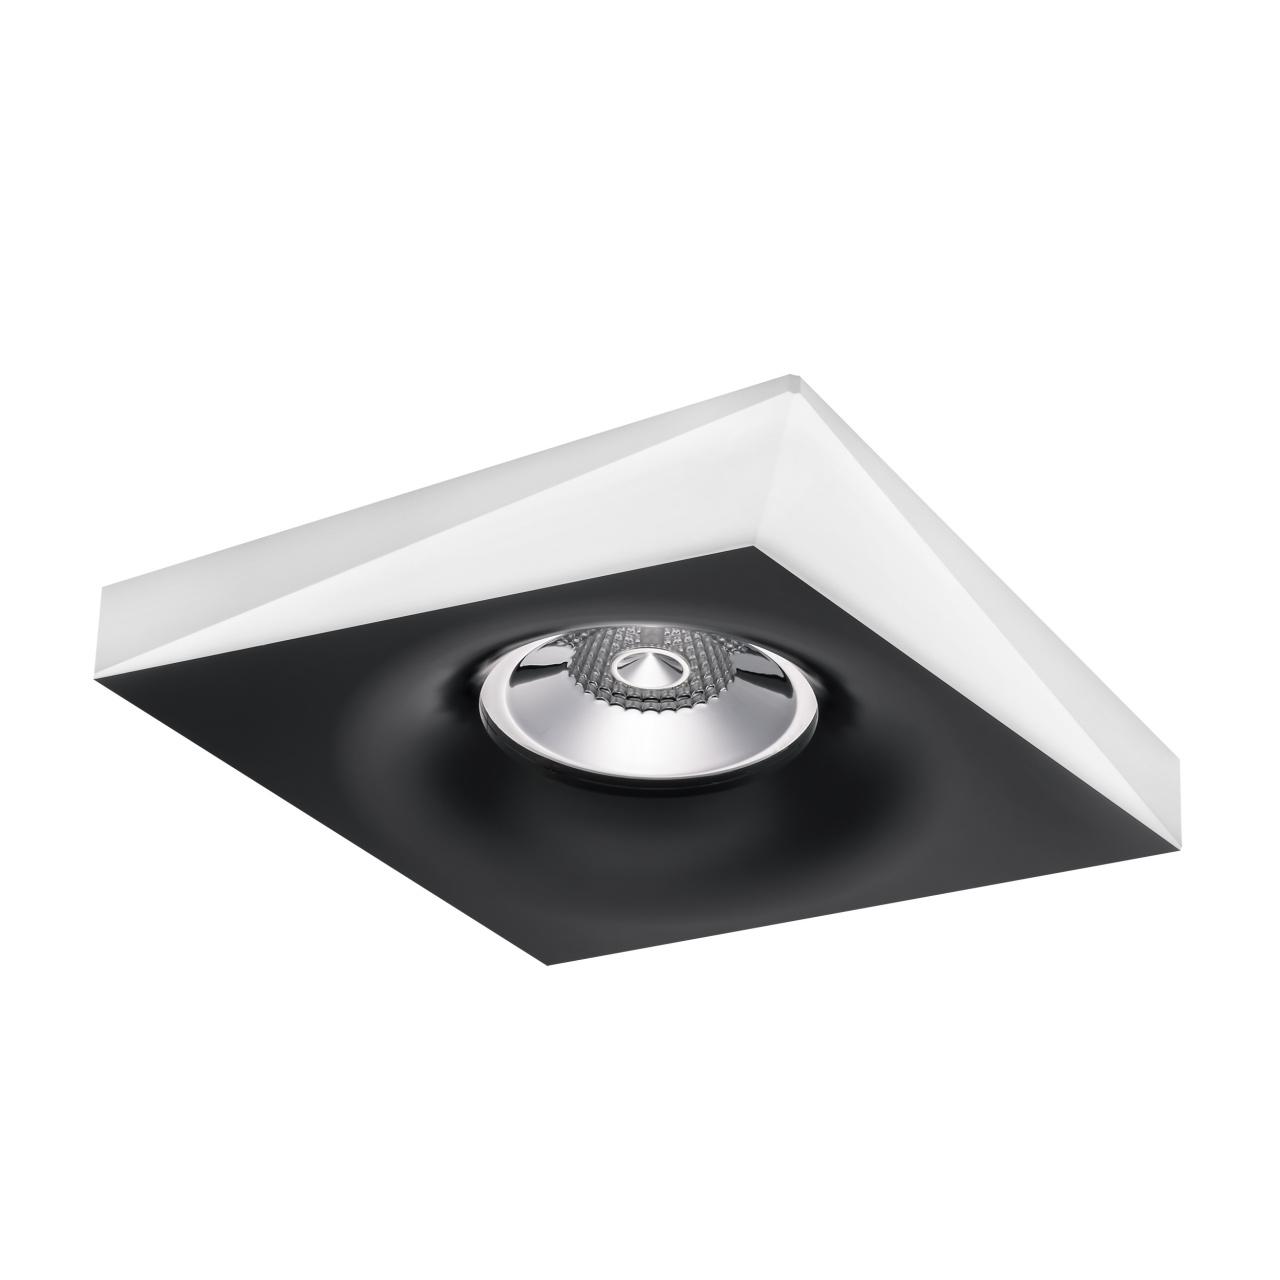 Светильник Miriade MR16 / HP16 черный+белый Lightstar 011005